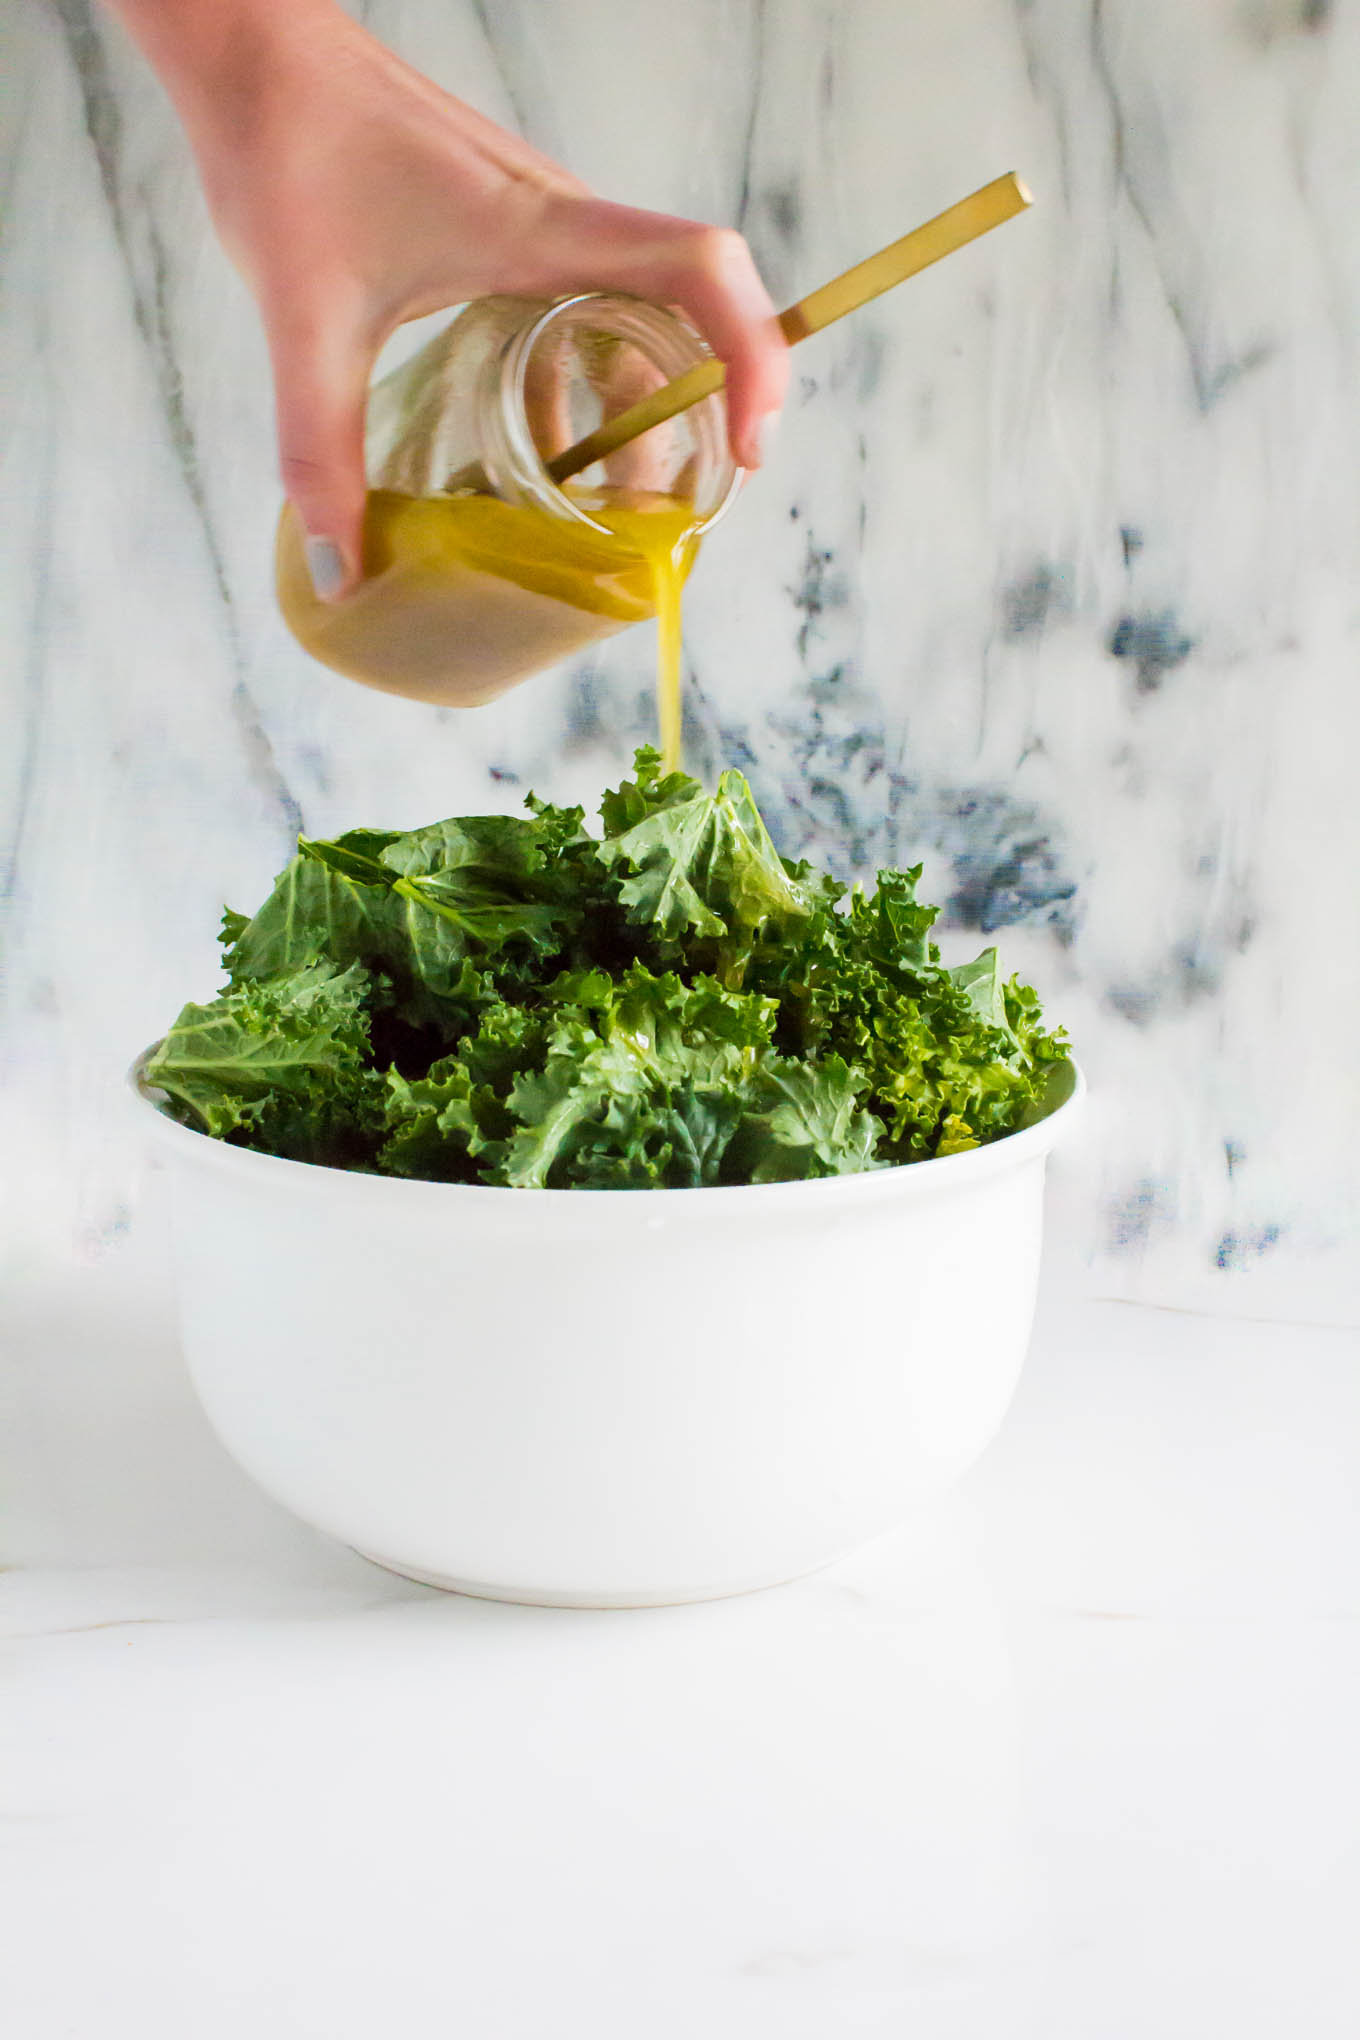 crispy chickpea kale salad with lemonade tea dressing | immaEATthat.com #ad